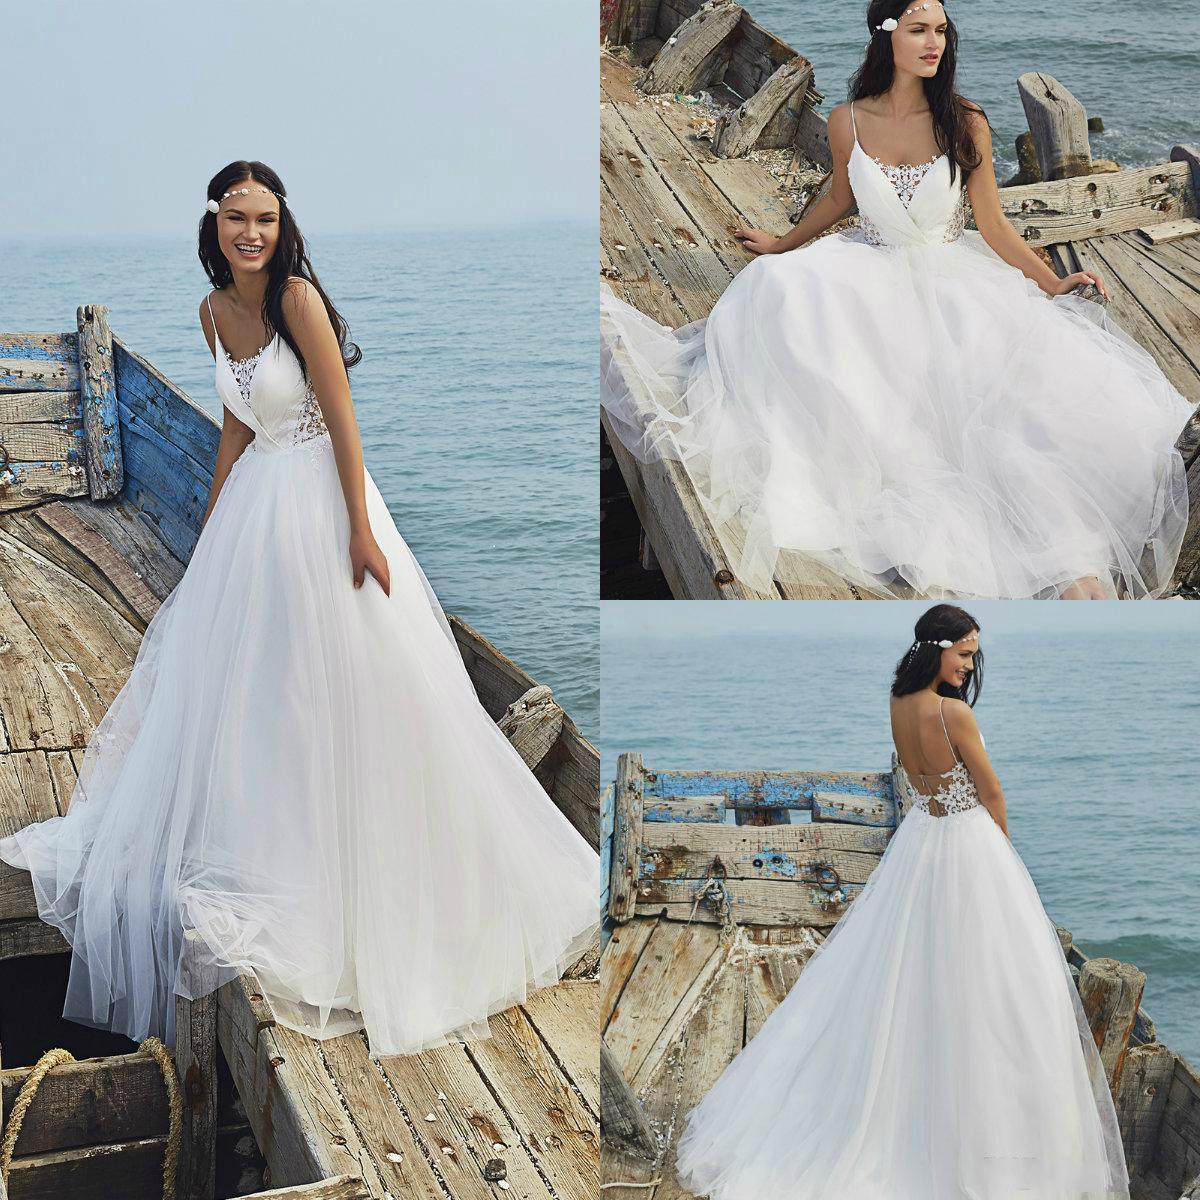 Discount 2019 Bohemian Wedding Dresses Spaghetti A Line Sweep Train Tulle  Simple Beach Wedding Dress Lace Appliques Custom Made Boho Bridal Gowns  Wholesale ... 24387df8f8d2